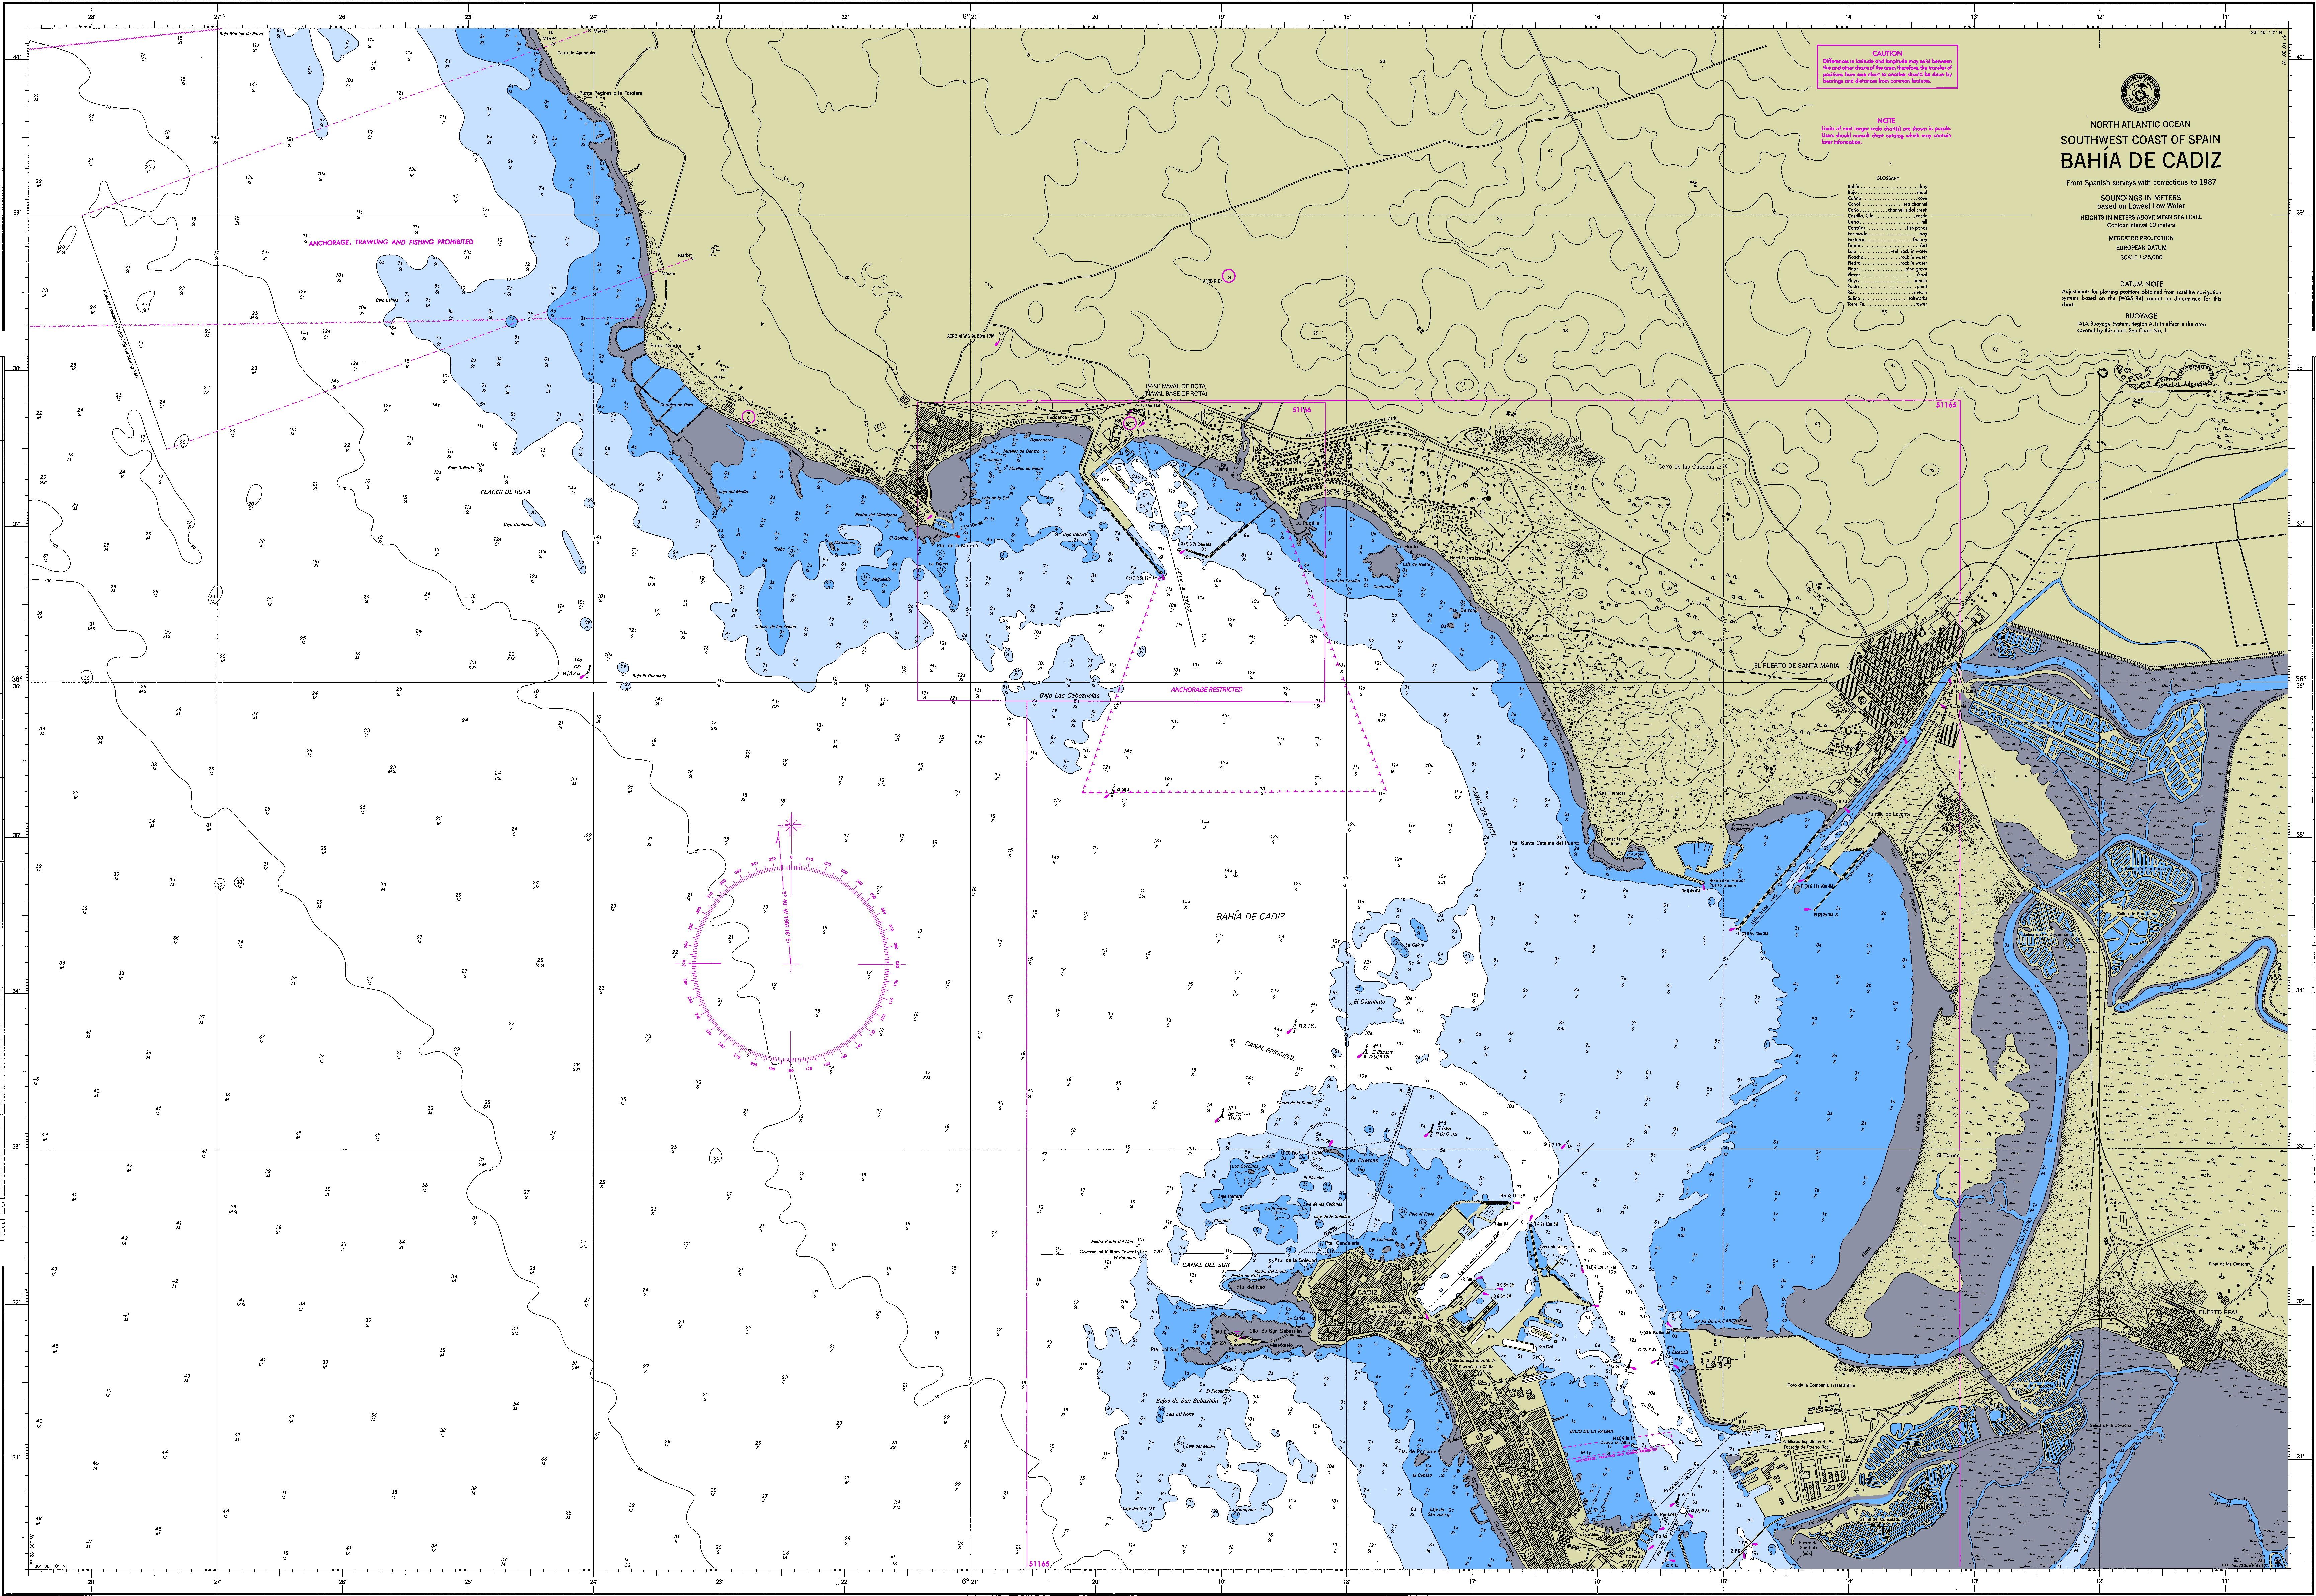 Carta náutica de la Bahía de Cádiz 1987